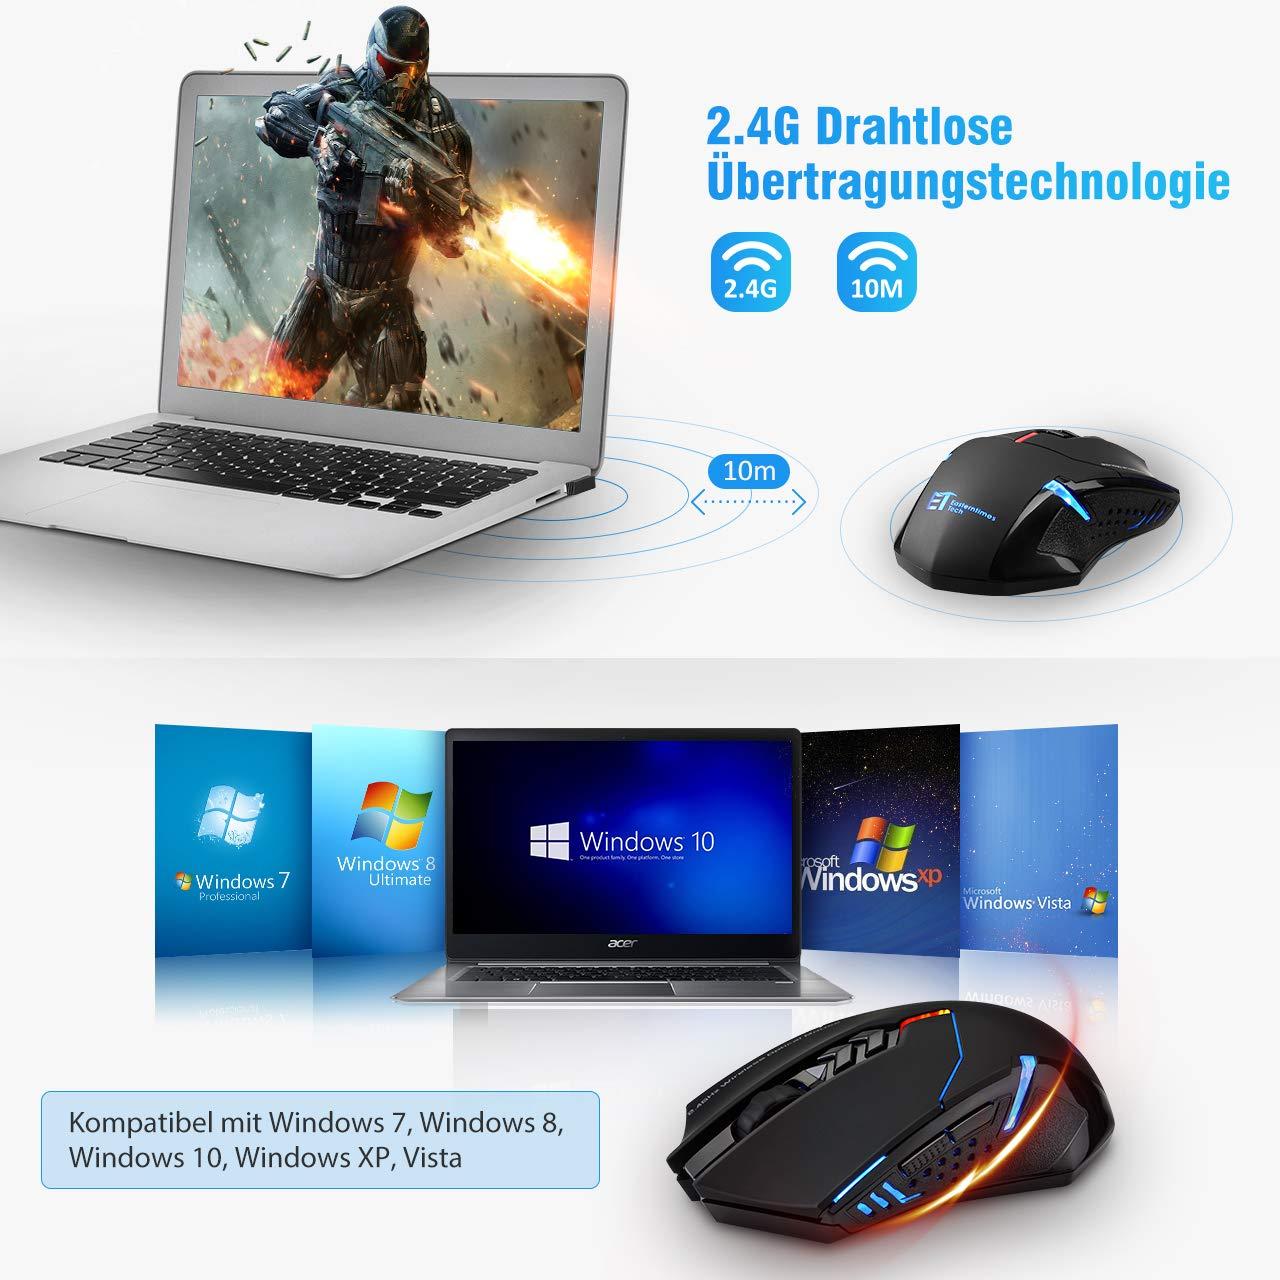 TOPELEK Laptop Maus Mute-Maus 2.4 G 2400 DPI Home. Drahtlose Maus Silent Schnurlos Funkmaus Gaming Maus Funk Wireless-Maus Optical Business Mouse M/äuse F/ür PC Laptop iMac MacBook Office 7 Tasten